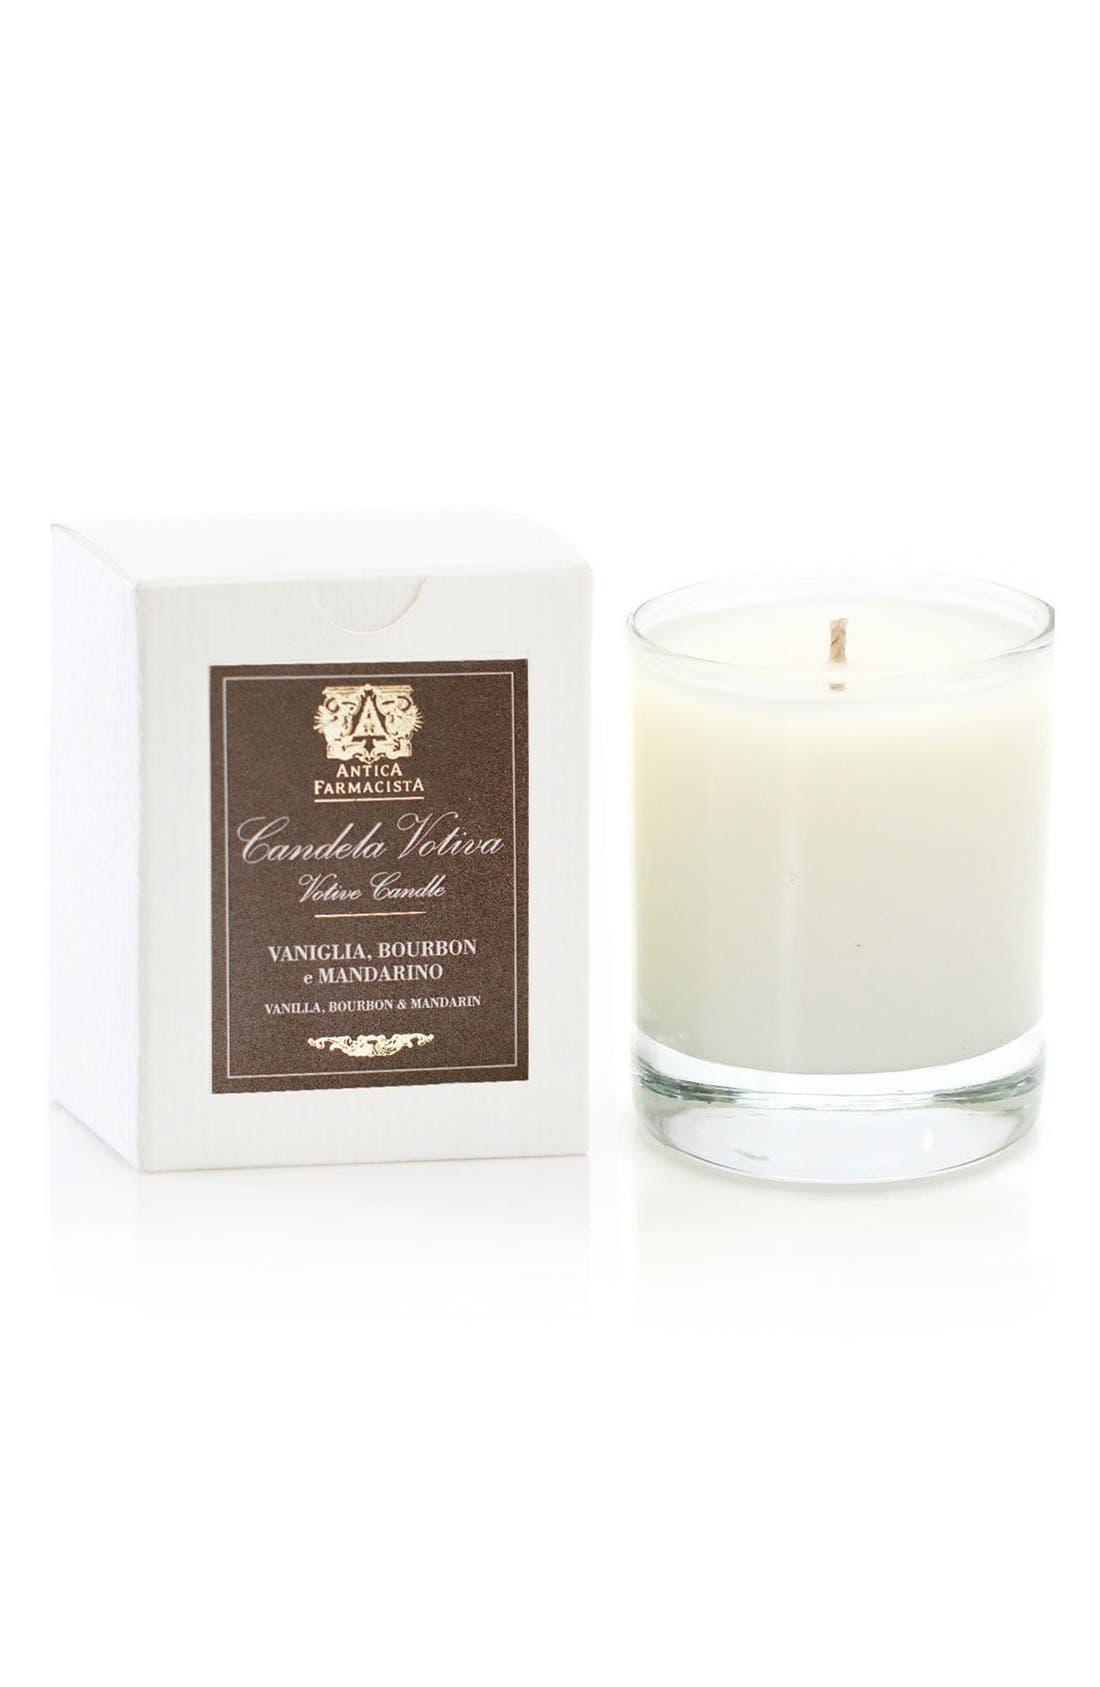 Vanilla, Bourbon & Mandarin Votive Candle,                             Main thumbnail 1, color,                             No Color